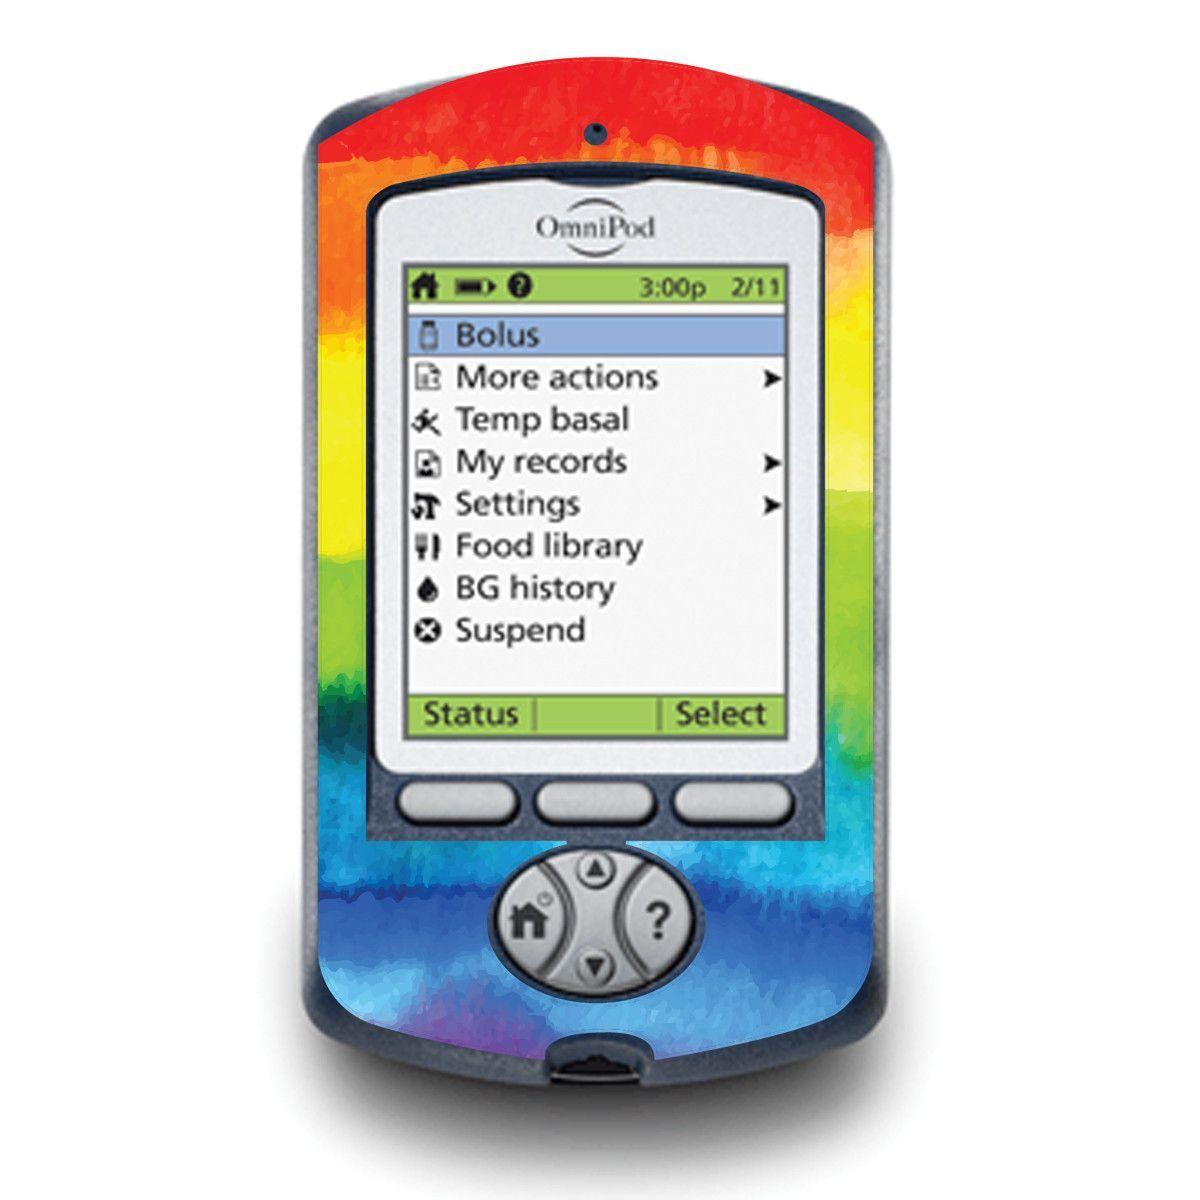 Rainbow for OmniPod PDM | Diabetic Stuff | Type 1 diabetes